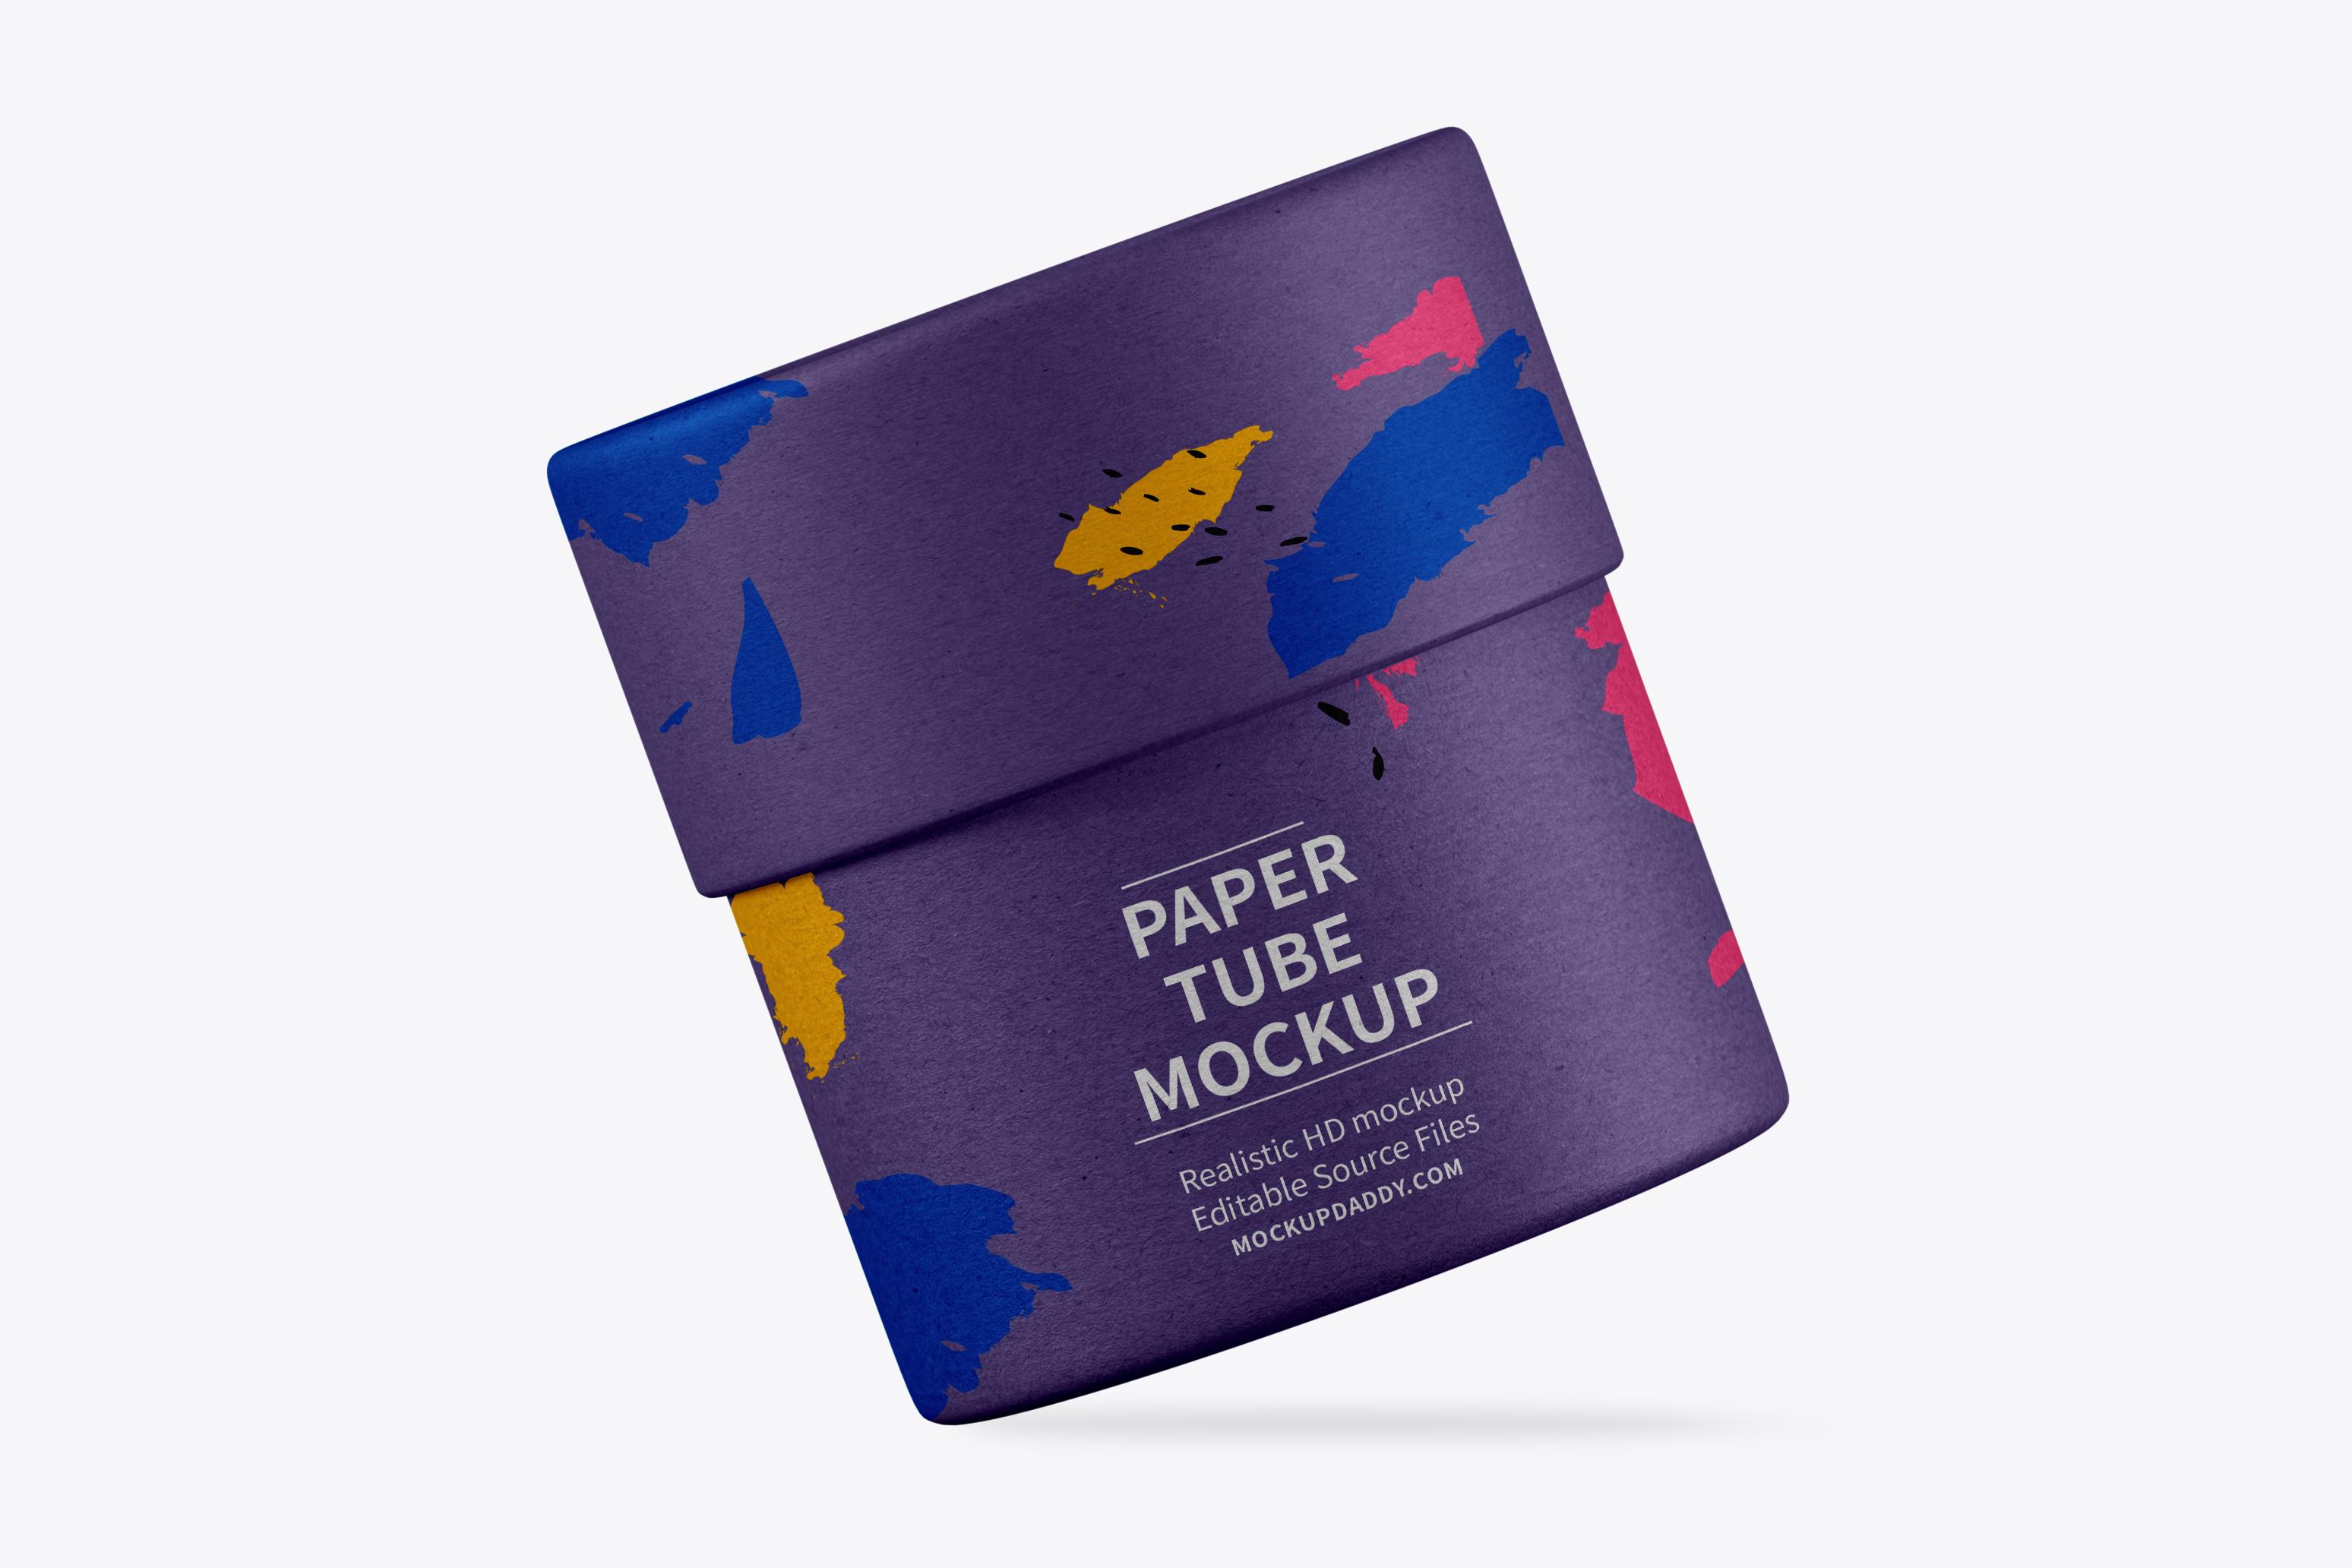 Small Corrugated Paper Tube Mockup - Premium Branding Mockups